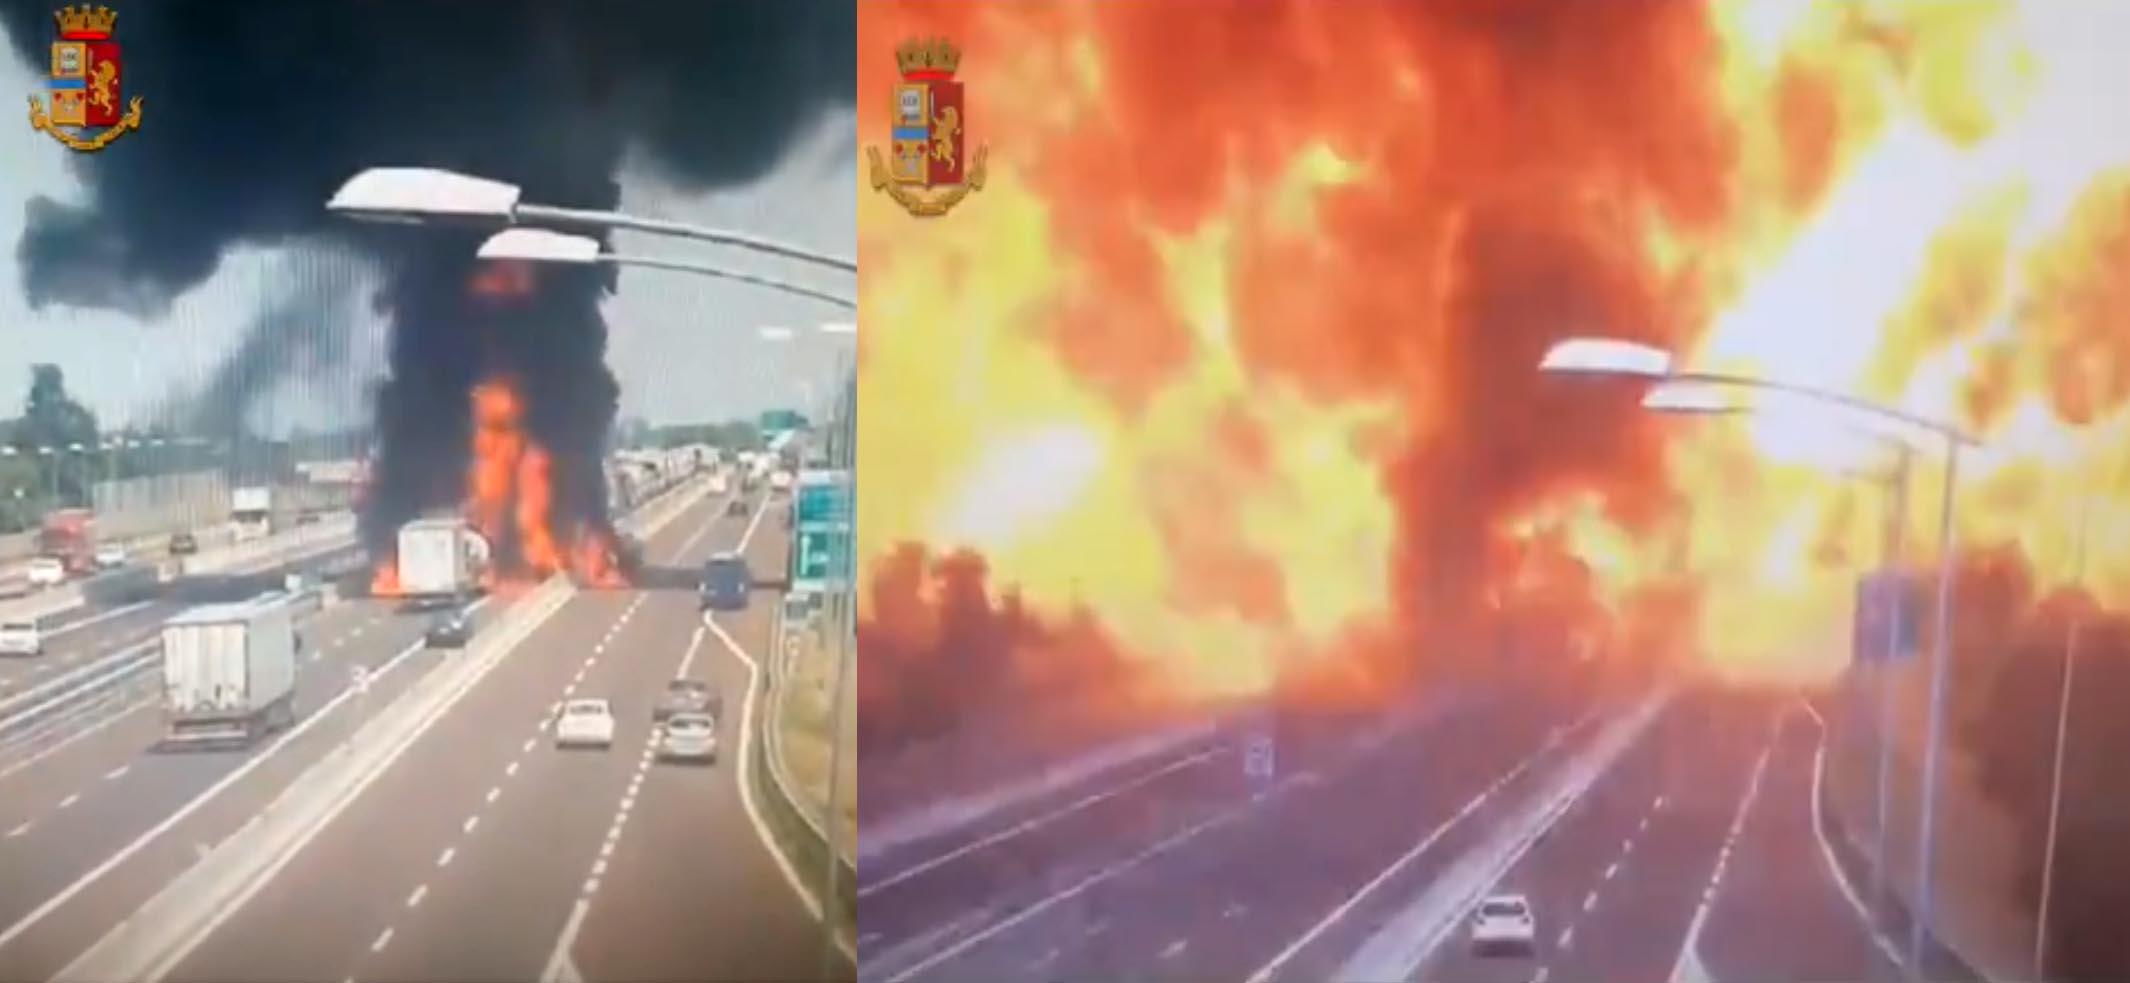 Photo of Ατύχημα με έκρηξη βυτιοφόρου σε αυτοκινητόδρομο στην Μπολόνια [vid]